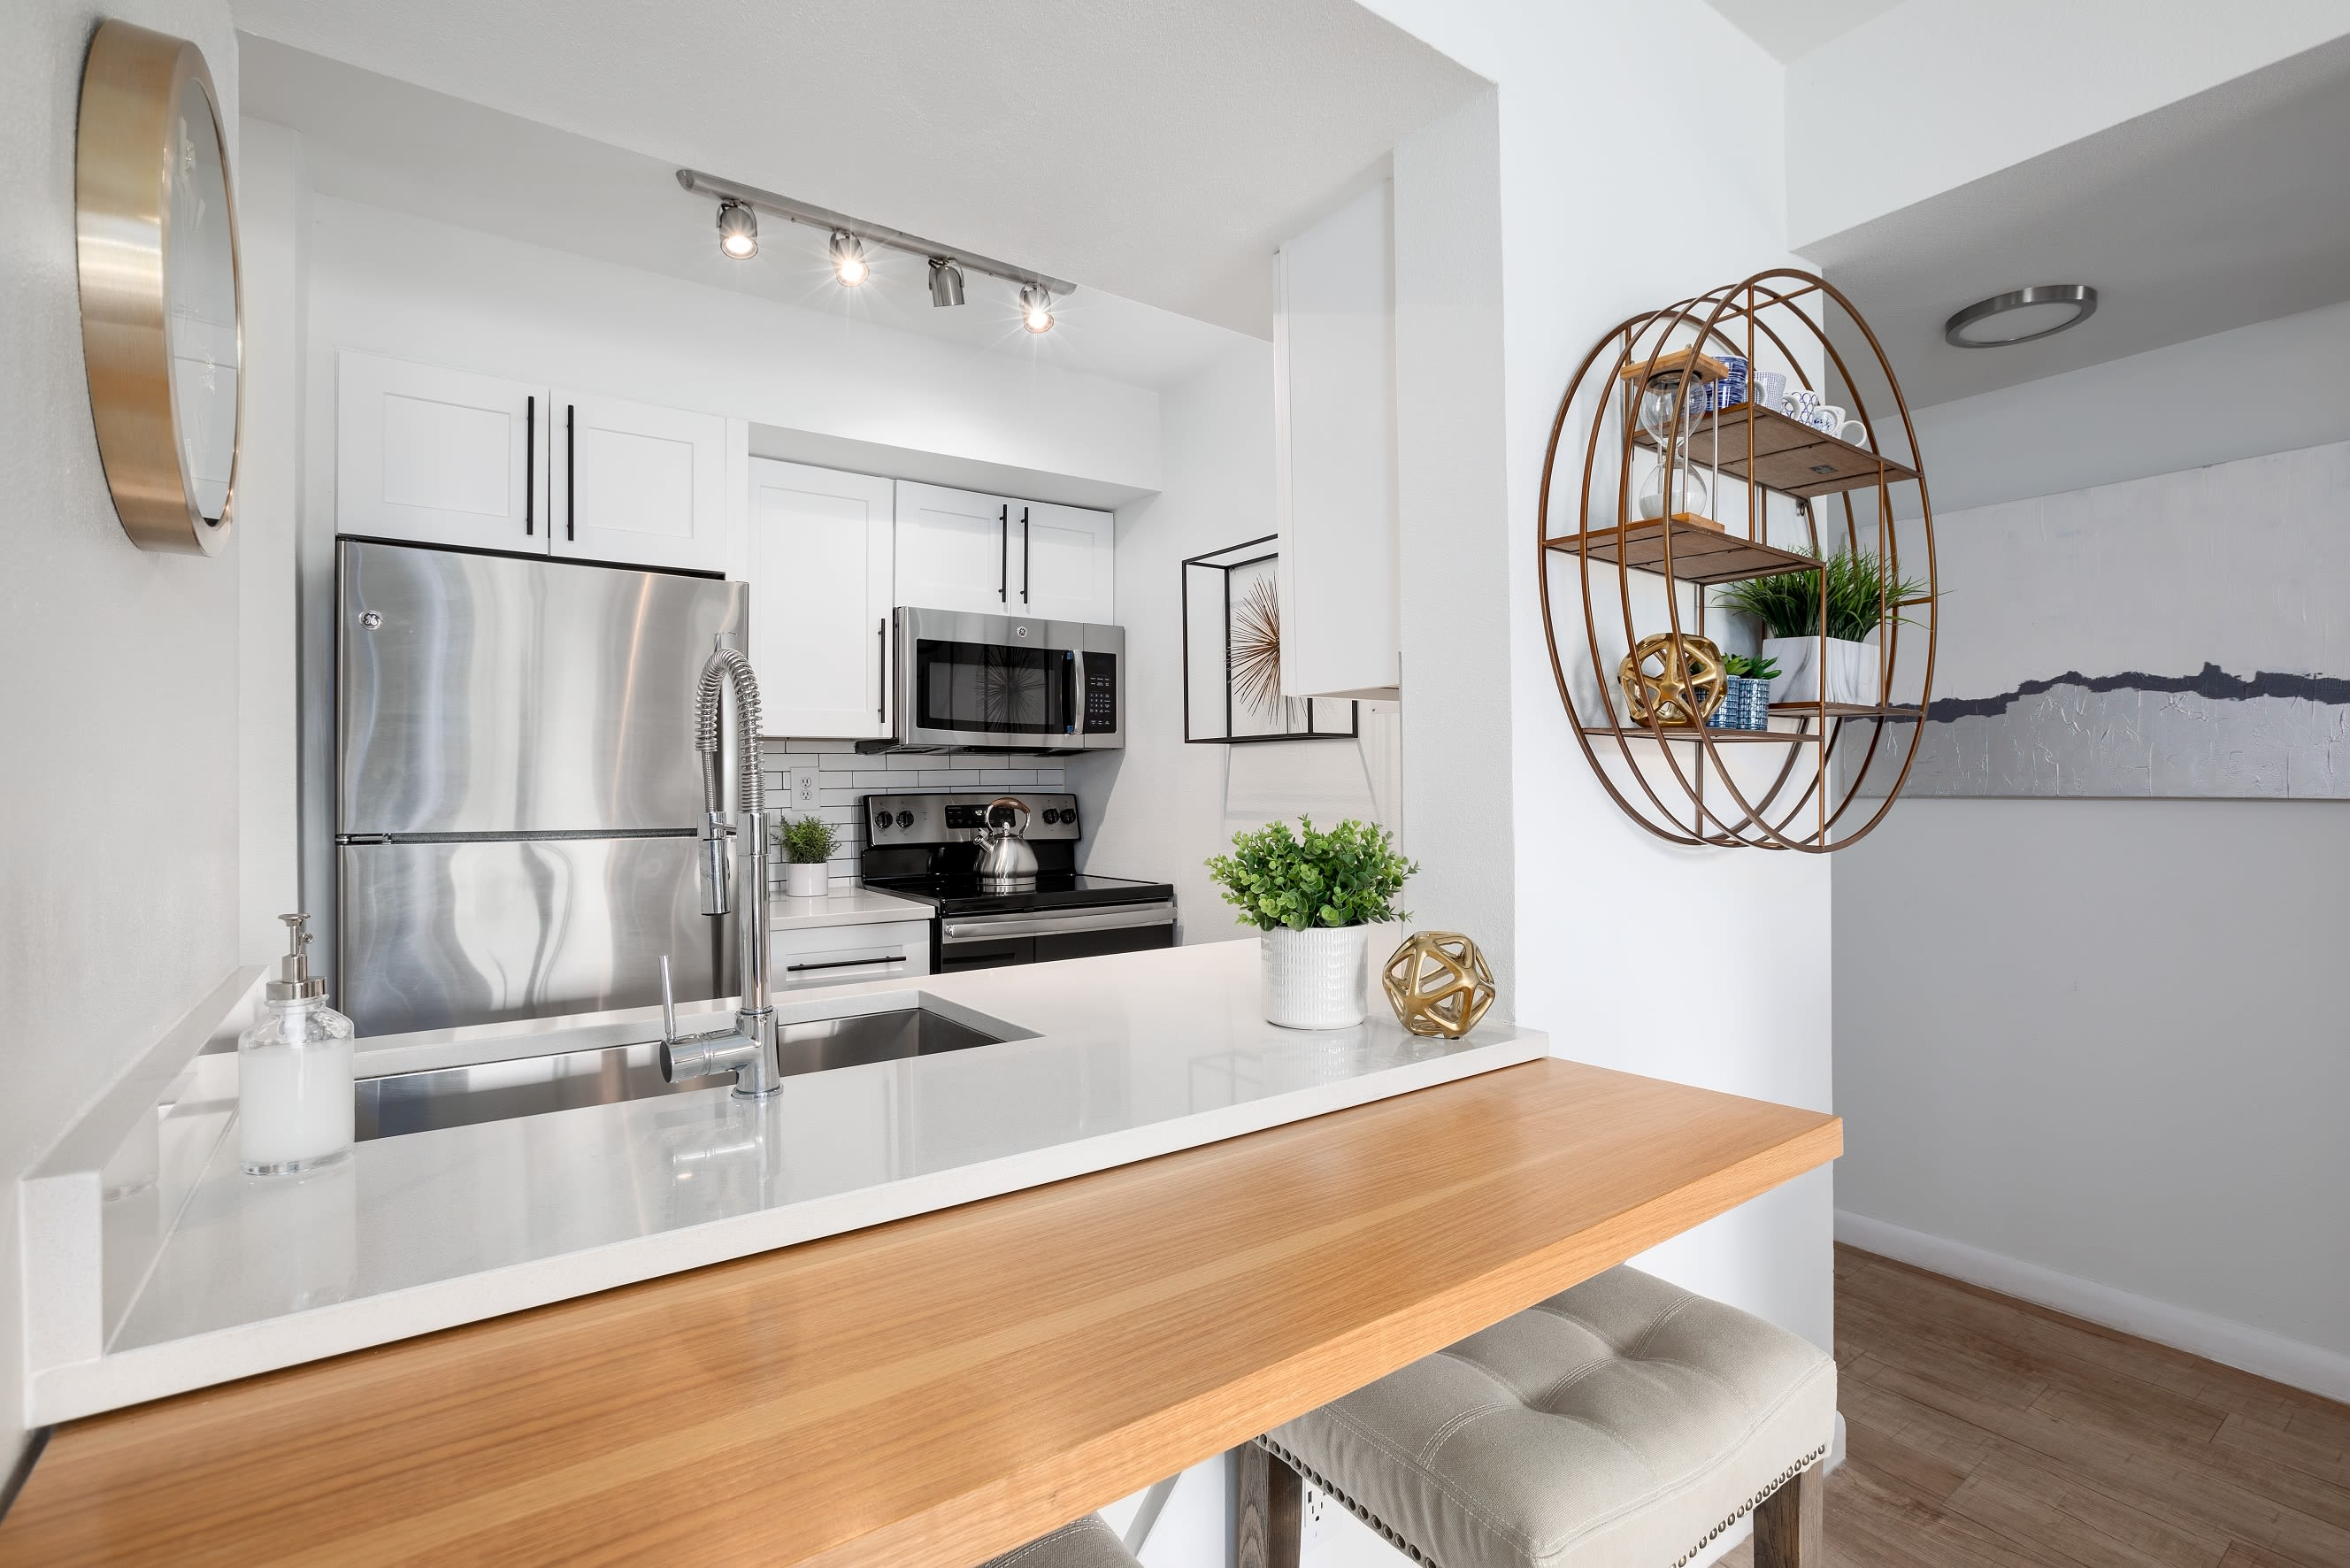 Modern kitchen with bar at Cielo Boca in Boca Raton, Florida